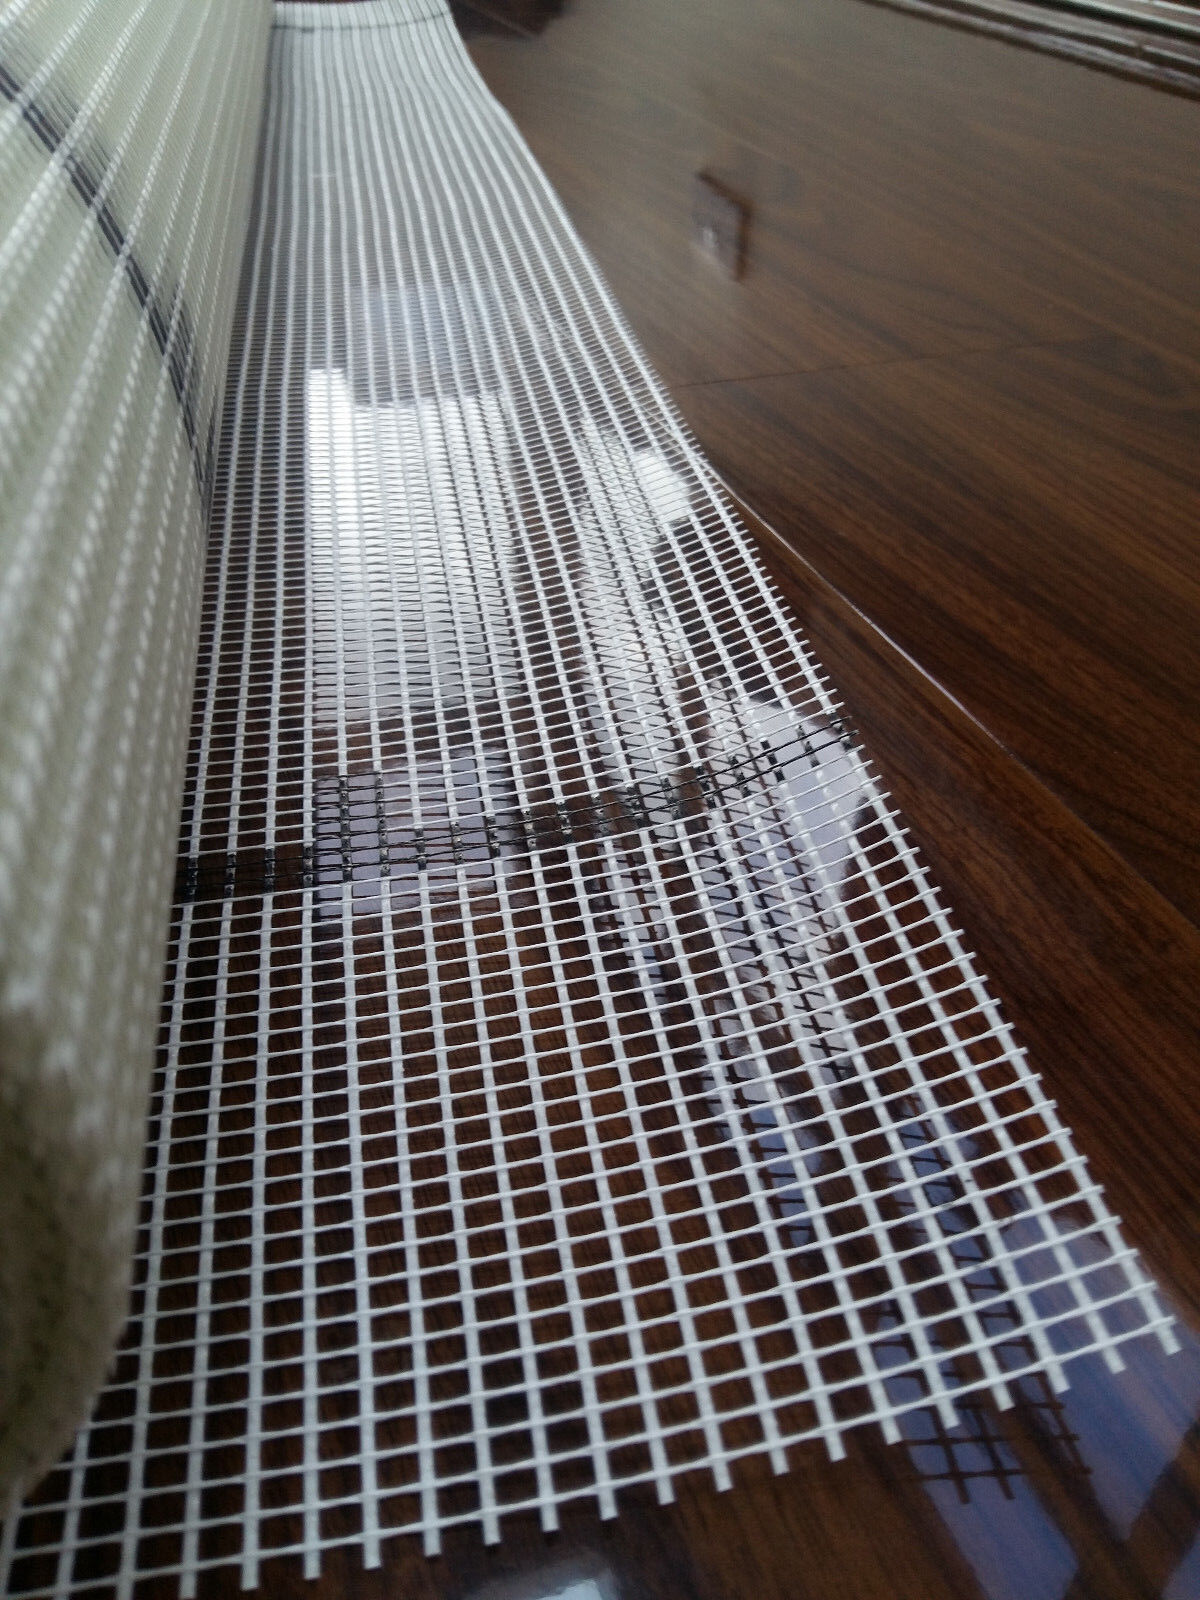 Fibreglass Mesh Backing For plaster rendering Crack Repair Plastering FREE POST